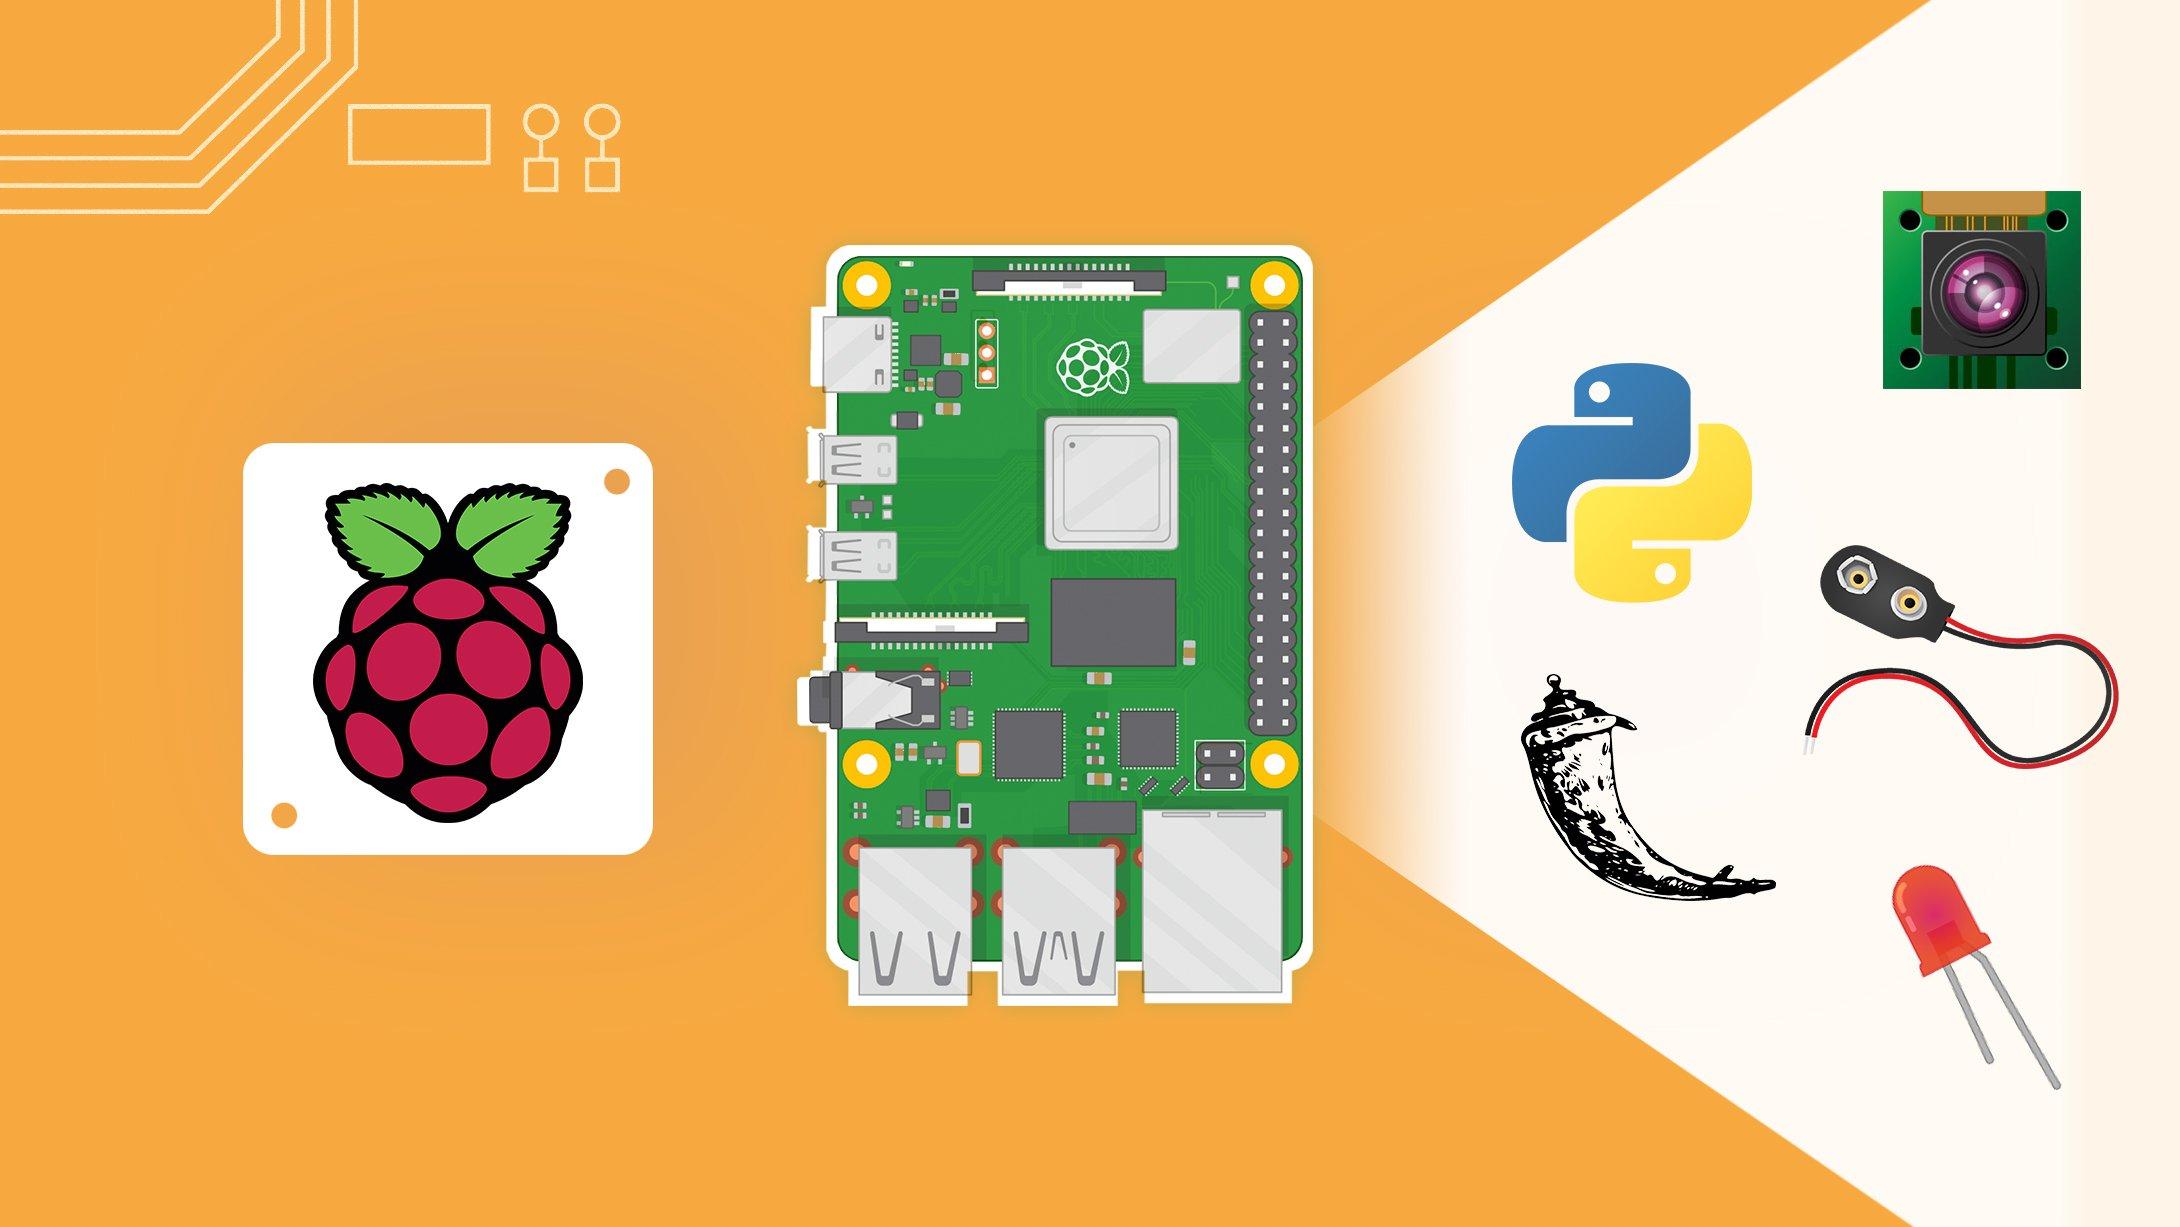 Raspberry Pi [4] for Beginners - Python3, GPIOs, Pi Camera, Flask, and More!